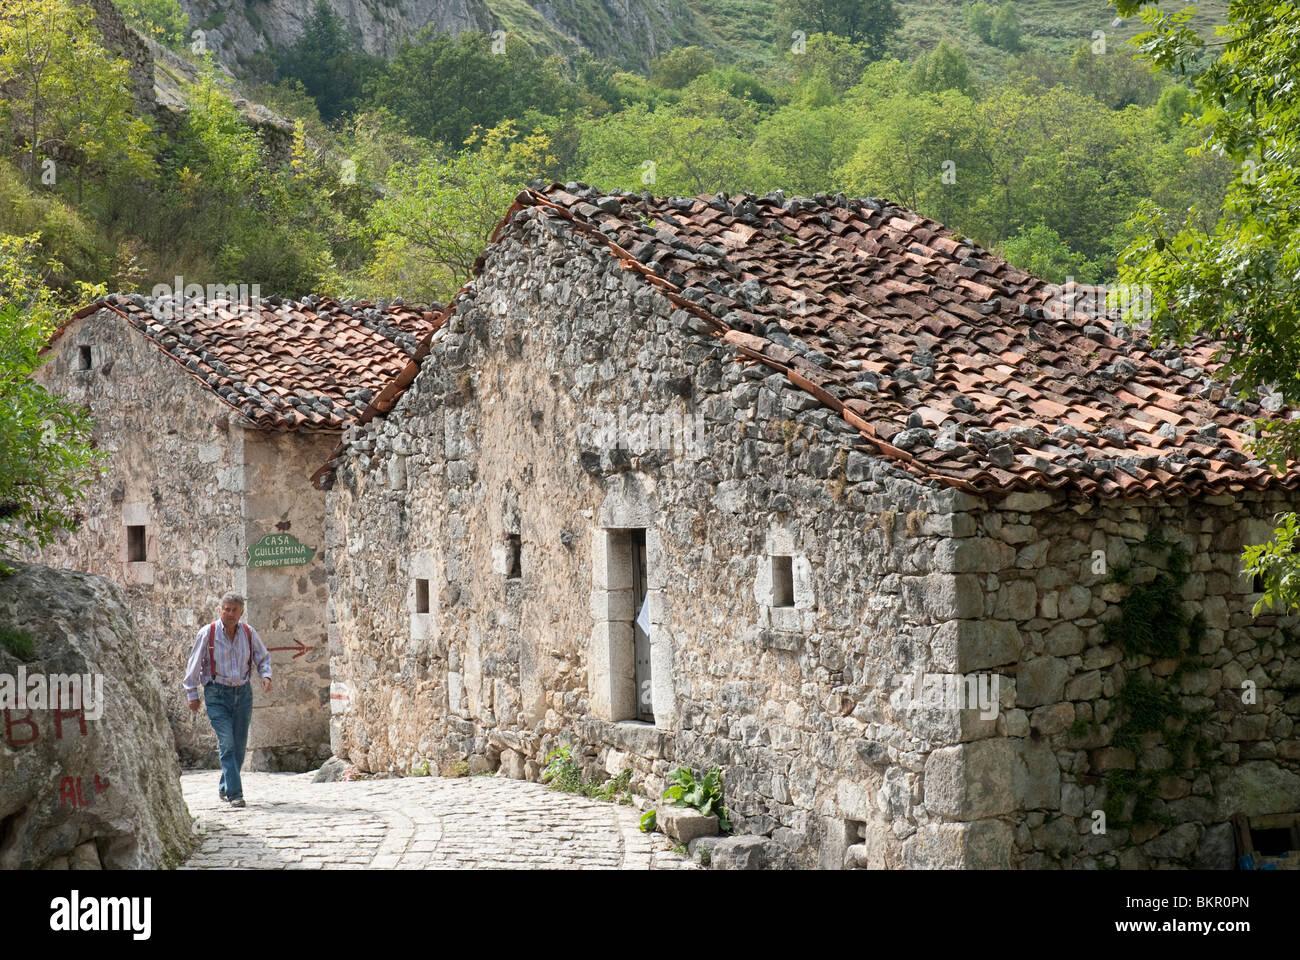 Lower Bulnes, a typical mountain village, Picos de Europa, Northern Spain - Stock Image